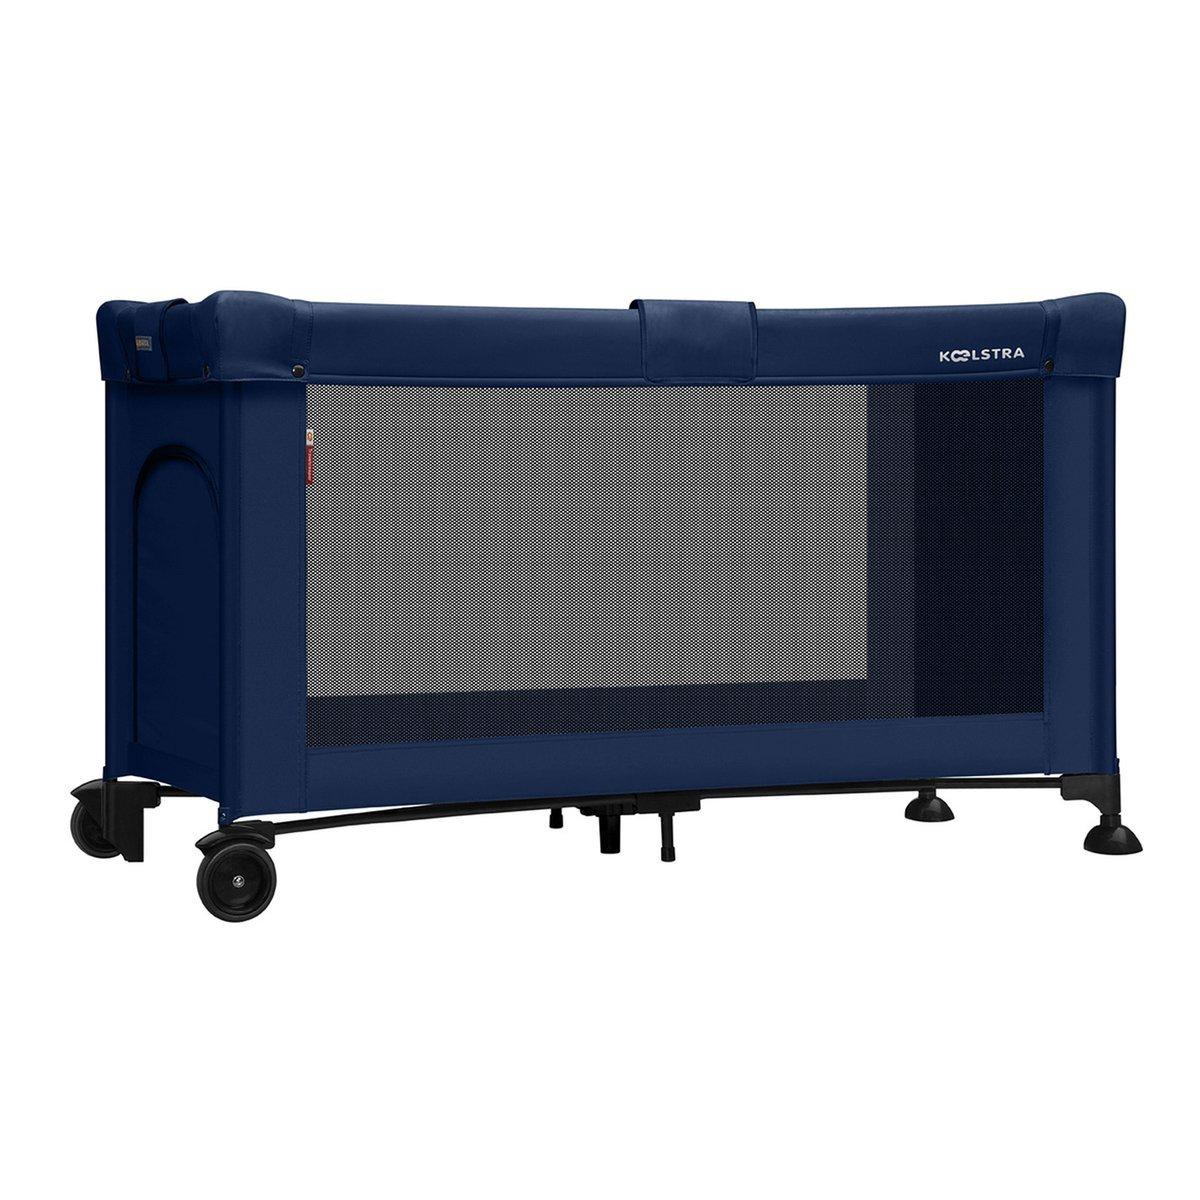 Koelstra 8643354 Reisebett   Travelsleeper T5, marine blau blau blau 90da04